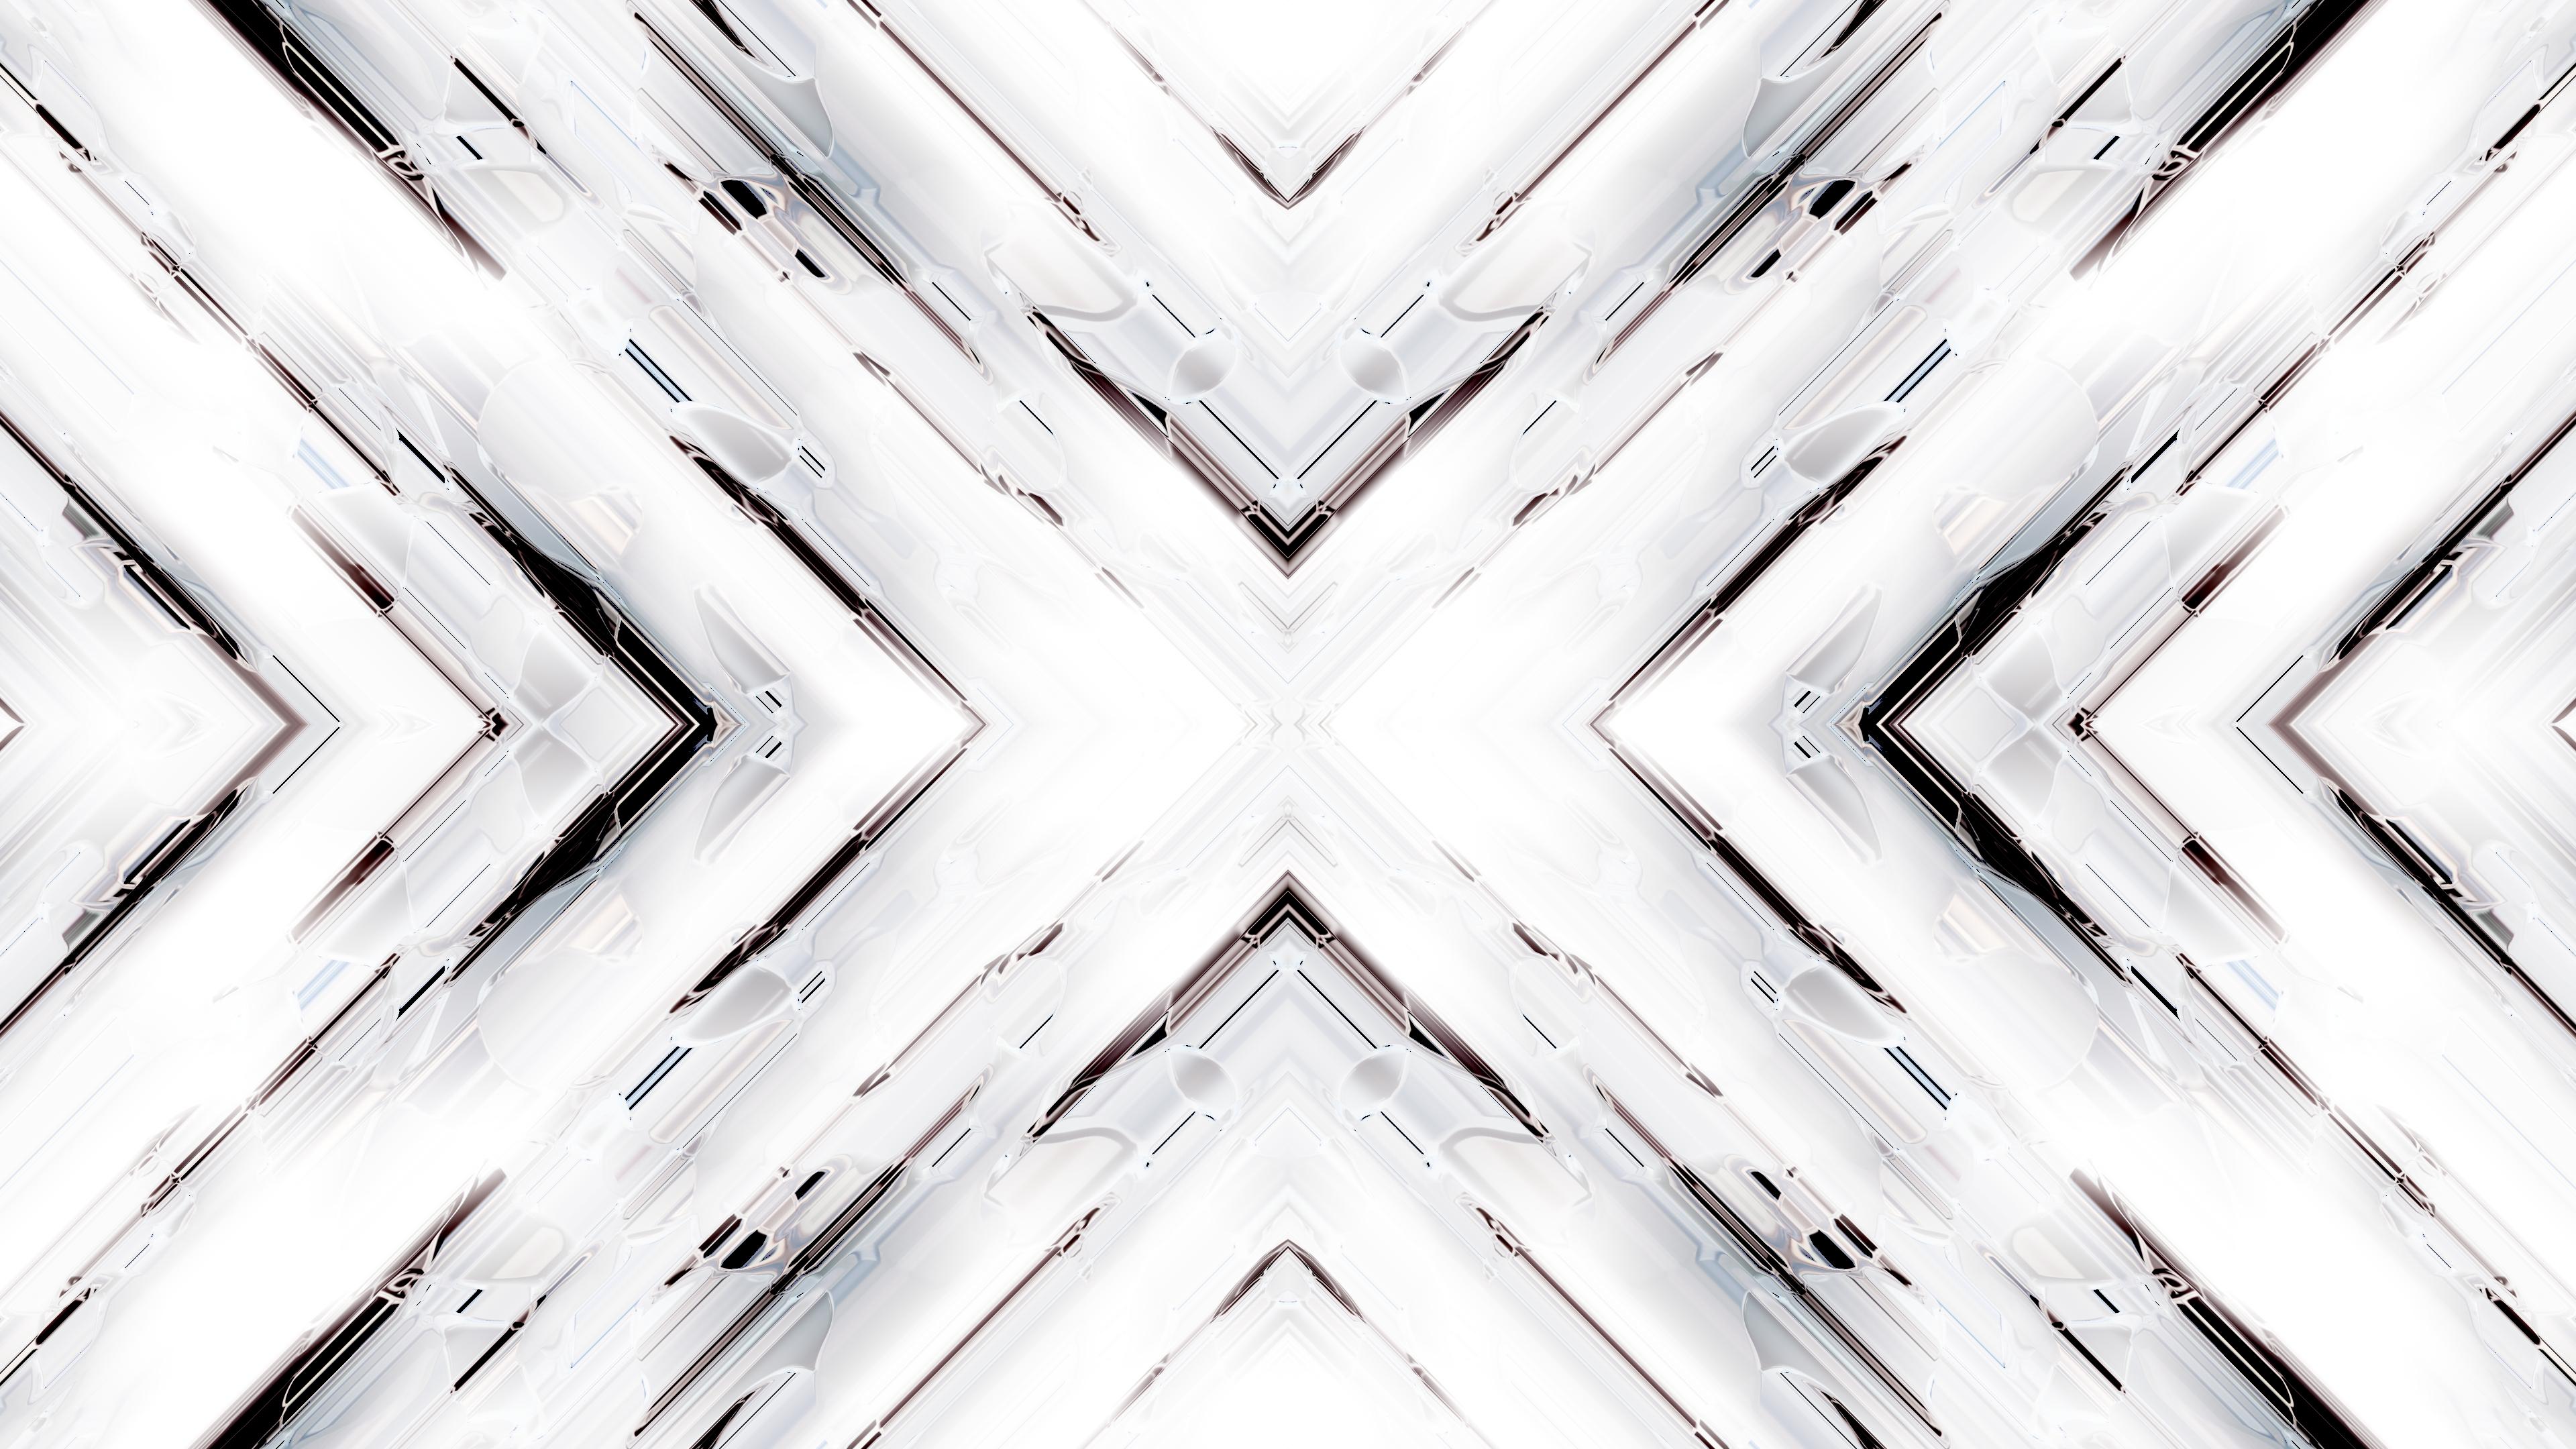 white render abstract art 1563221511 - White Render Abstract Art - hd-wallpapers, abstract wallpapers, 4k-wallpapers